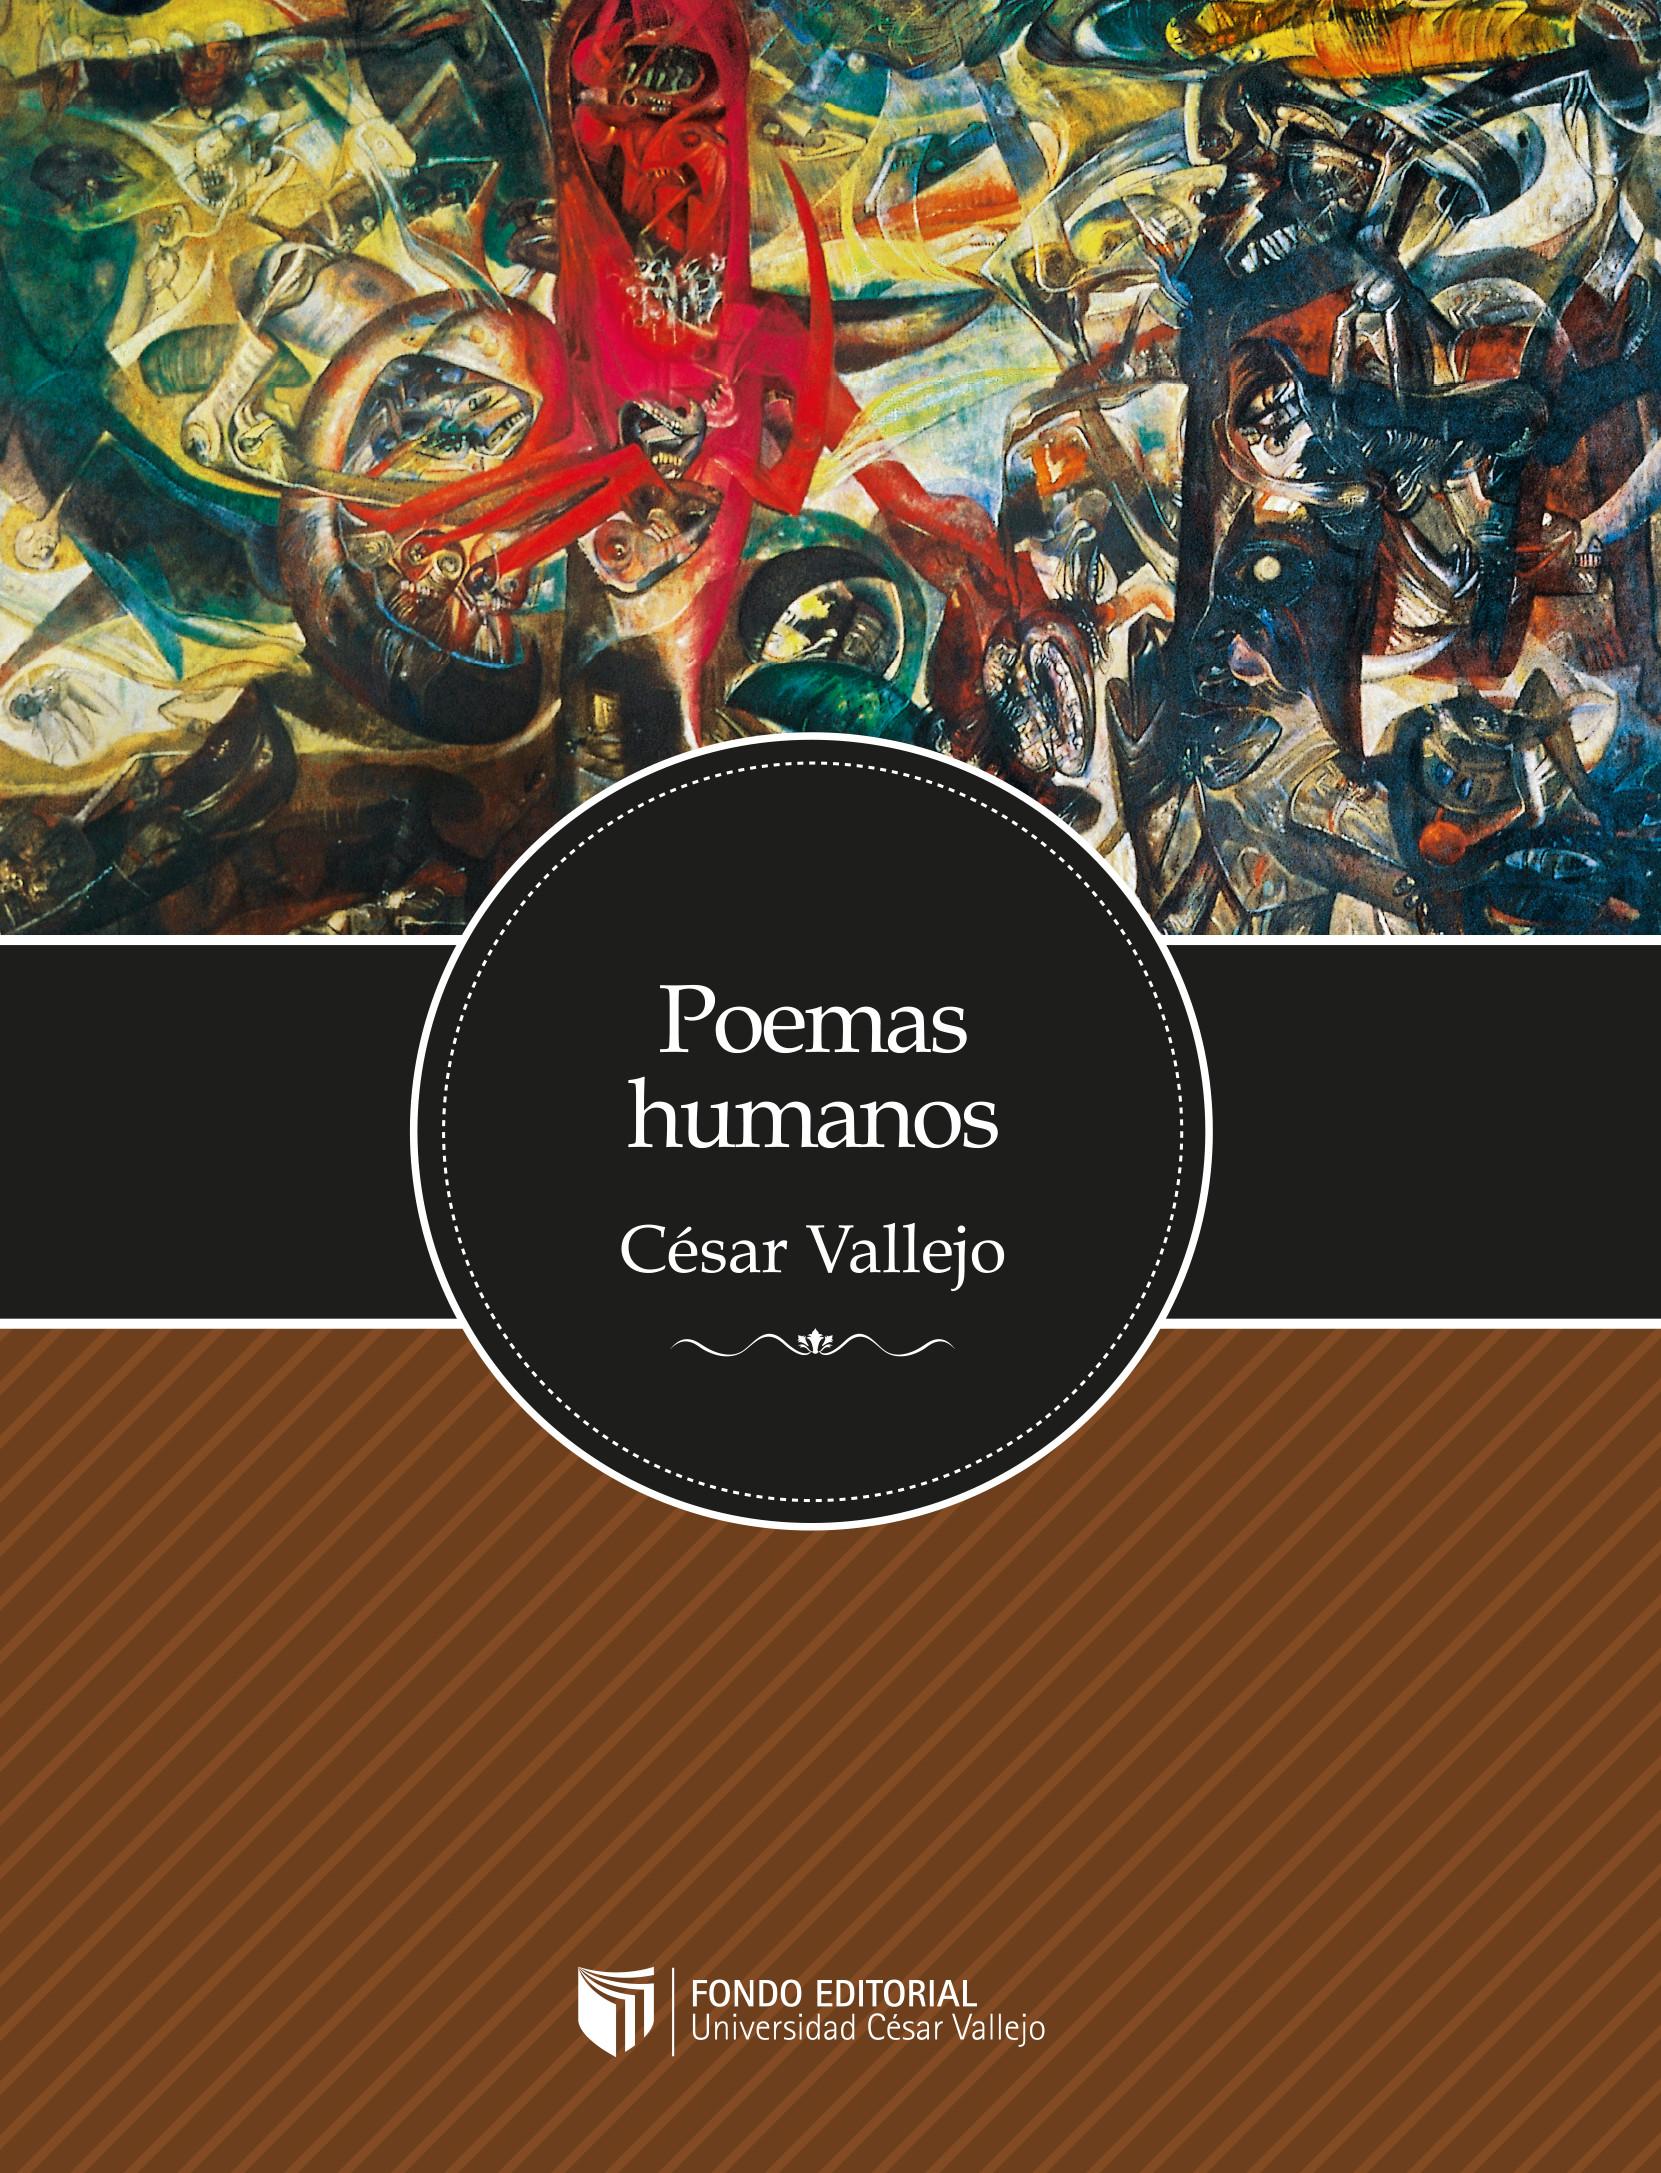 Poemas humanos